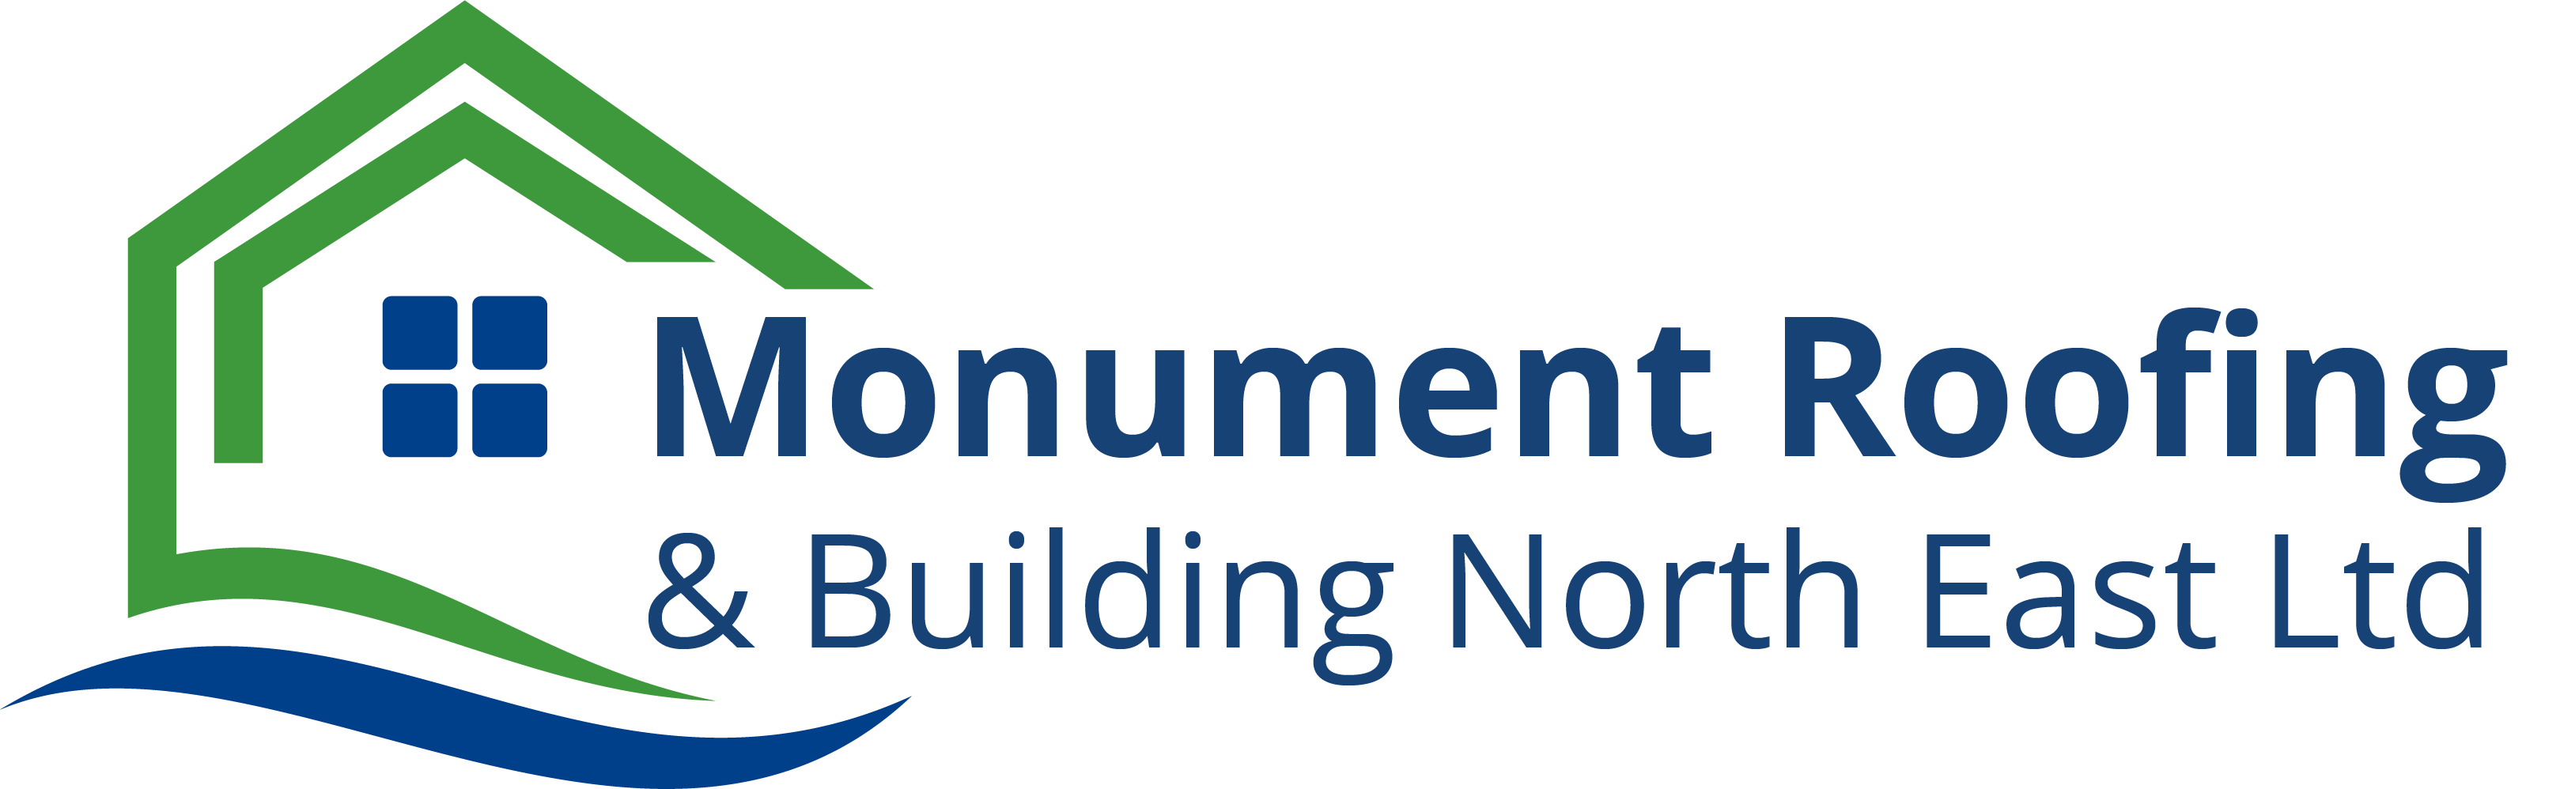 Monument Roofing & Building Ltd Logo 2